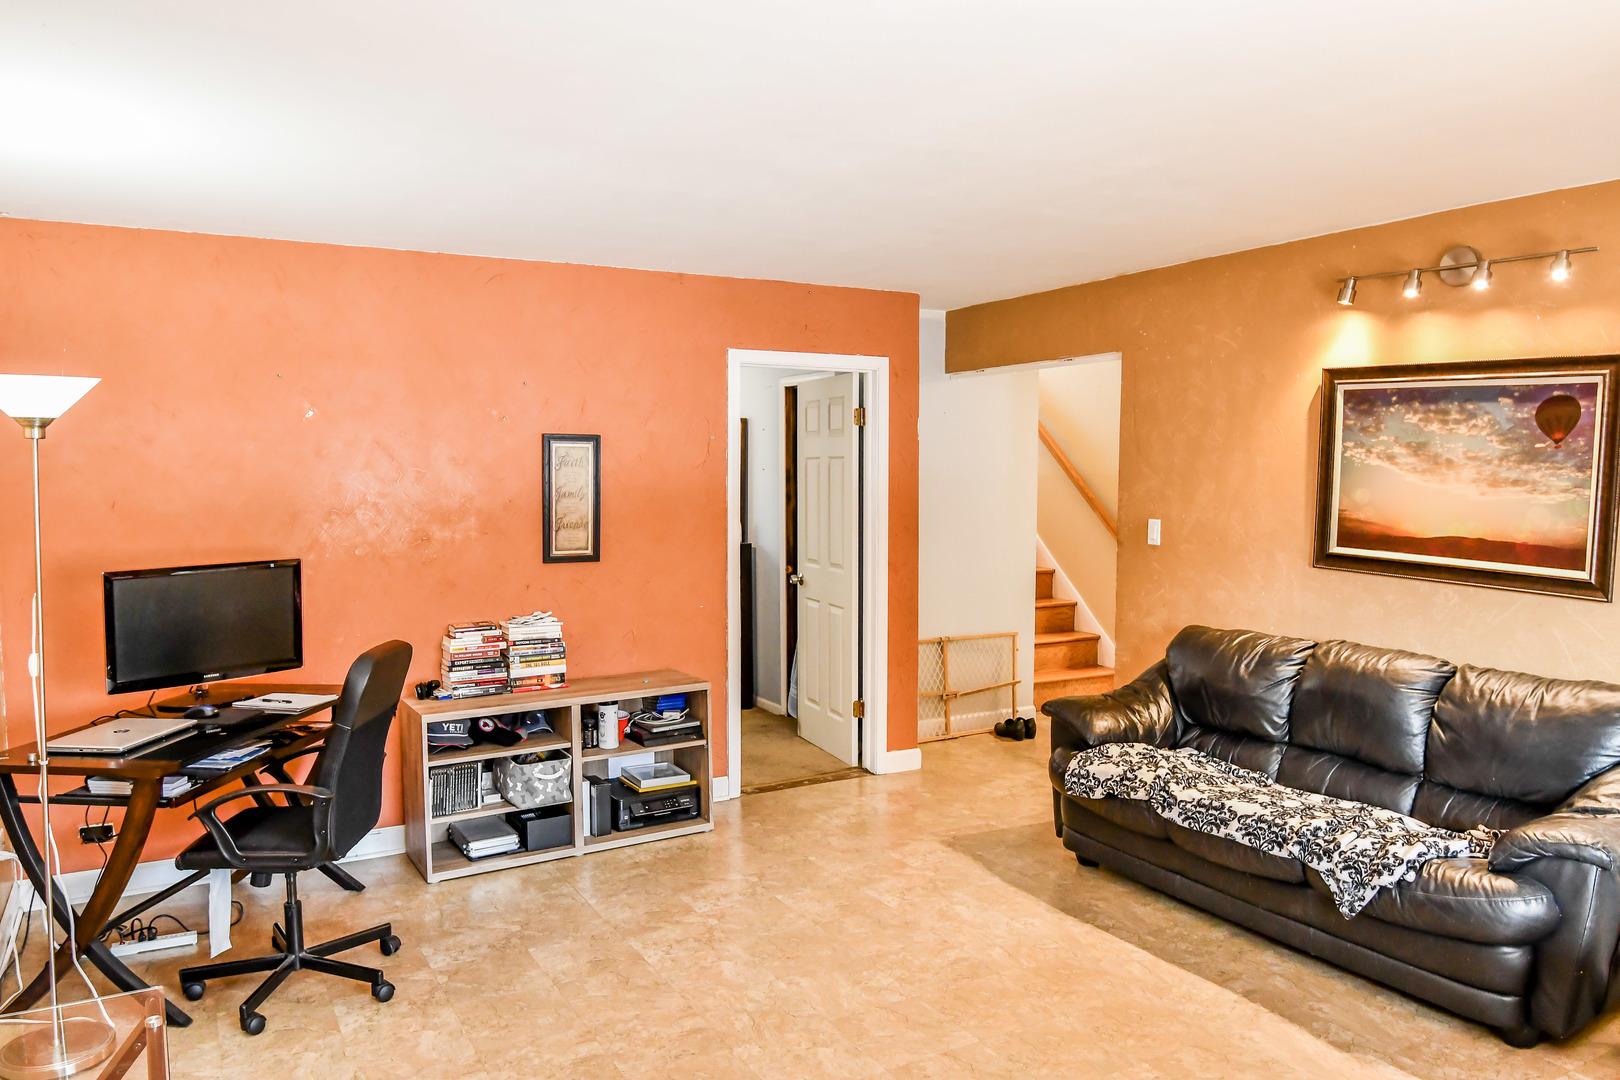 1443 South Busse, Mount Prospect, Illinois, 60056